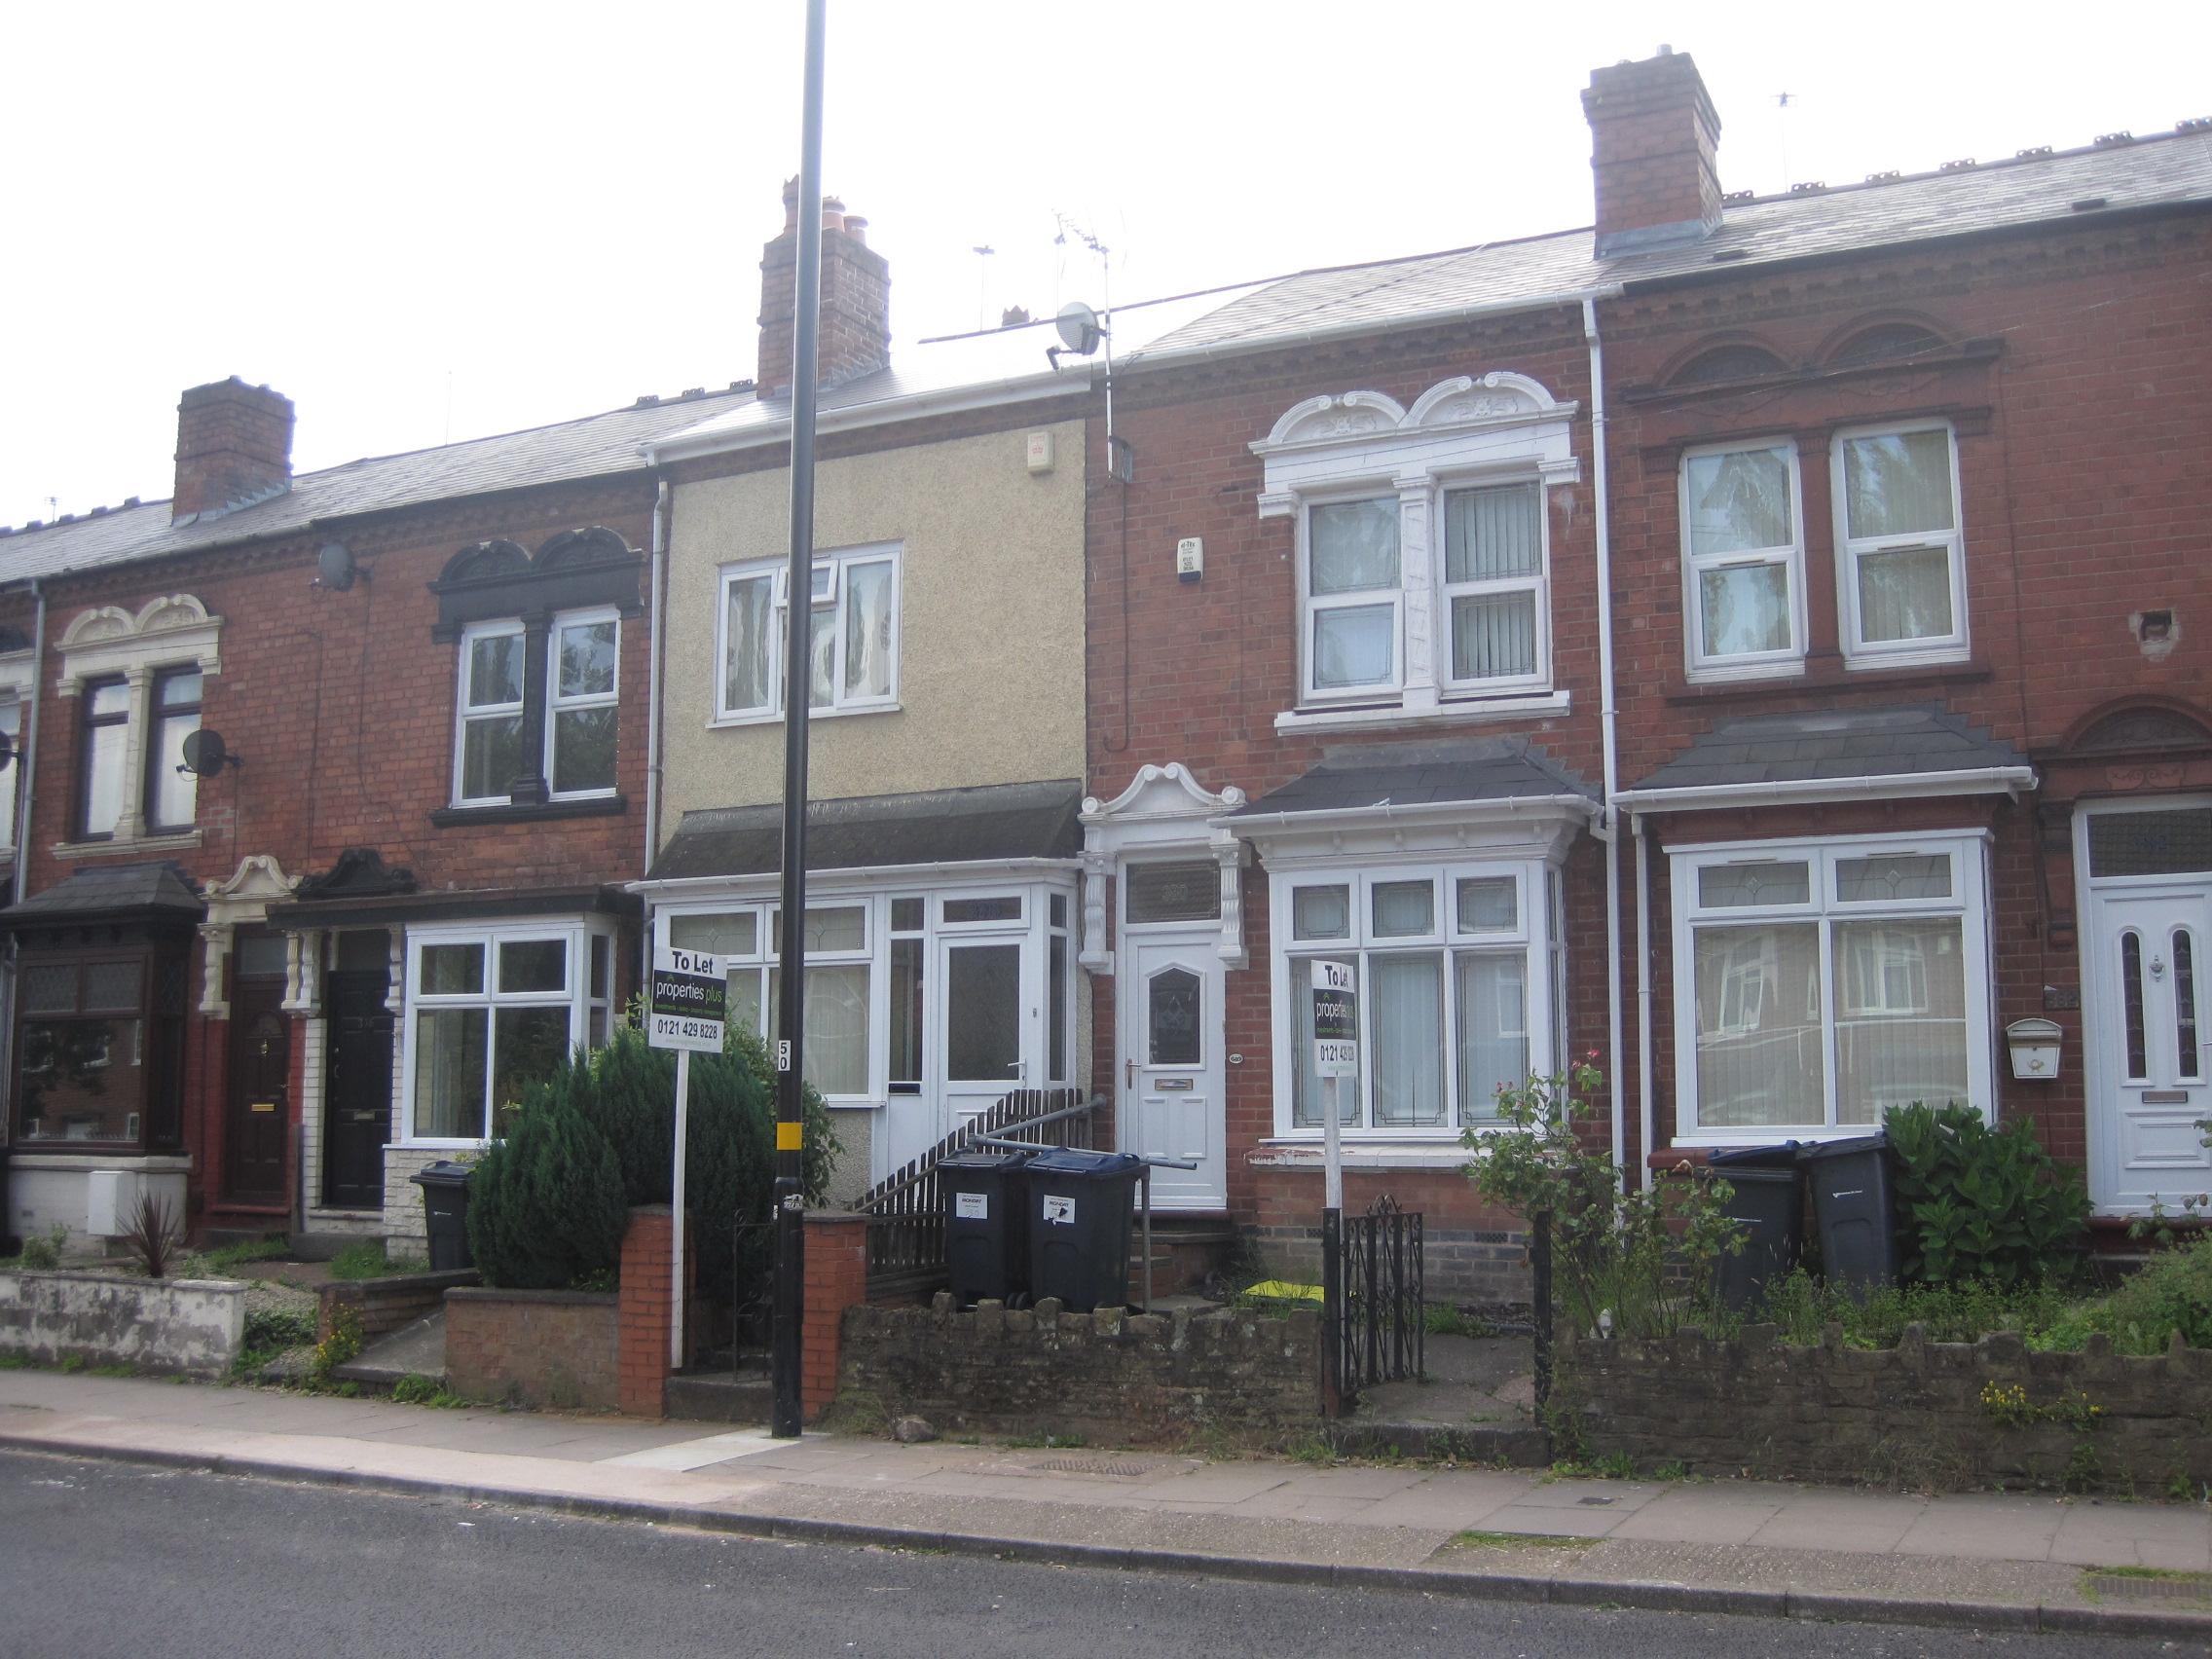 380 Portland road, Edgbaston, Birmingham, B17 8LT